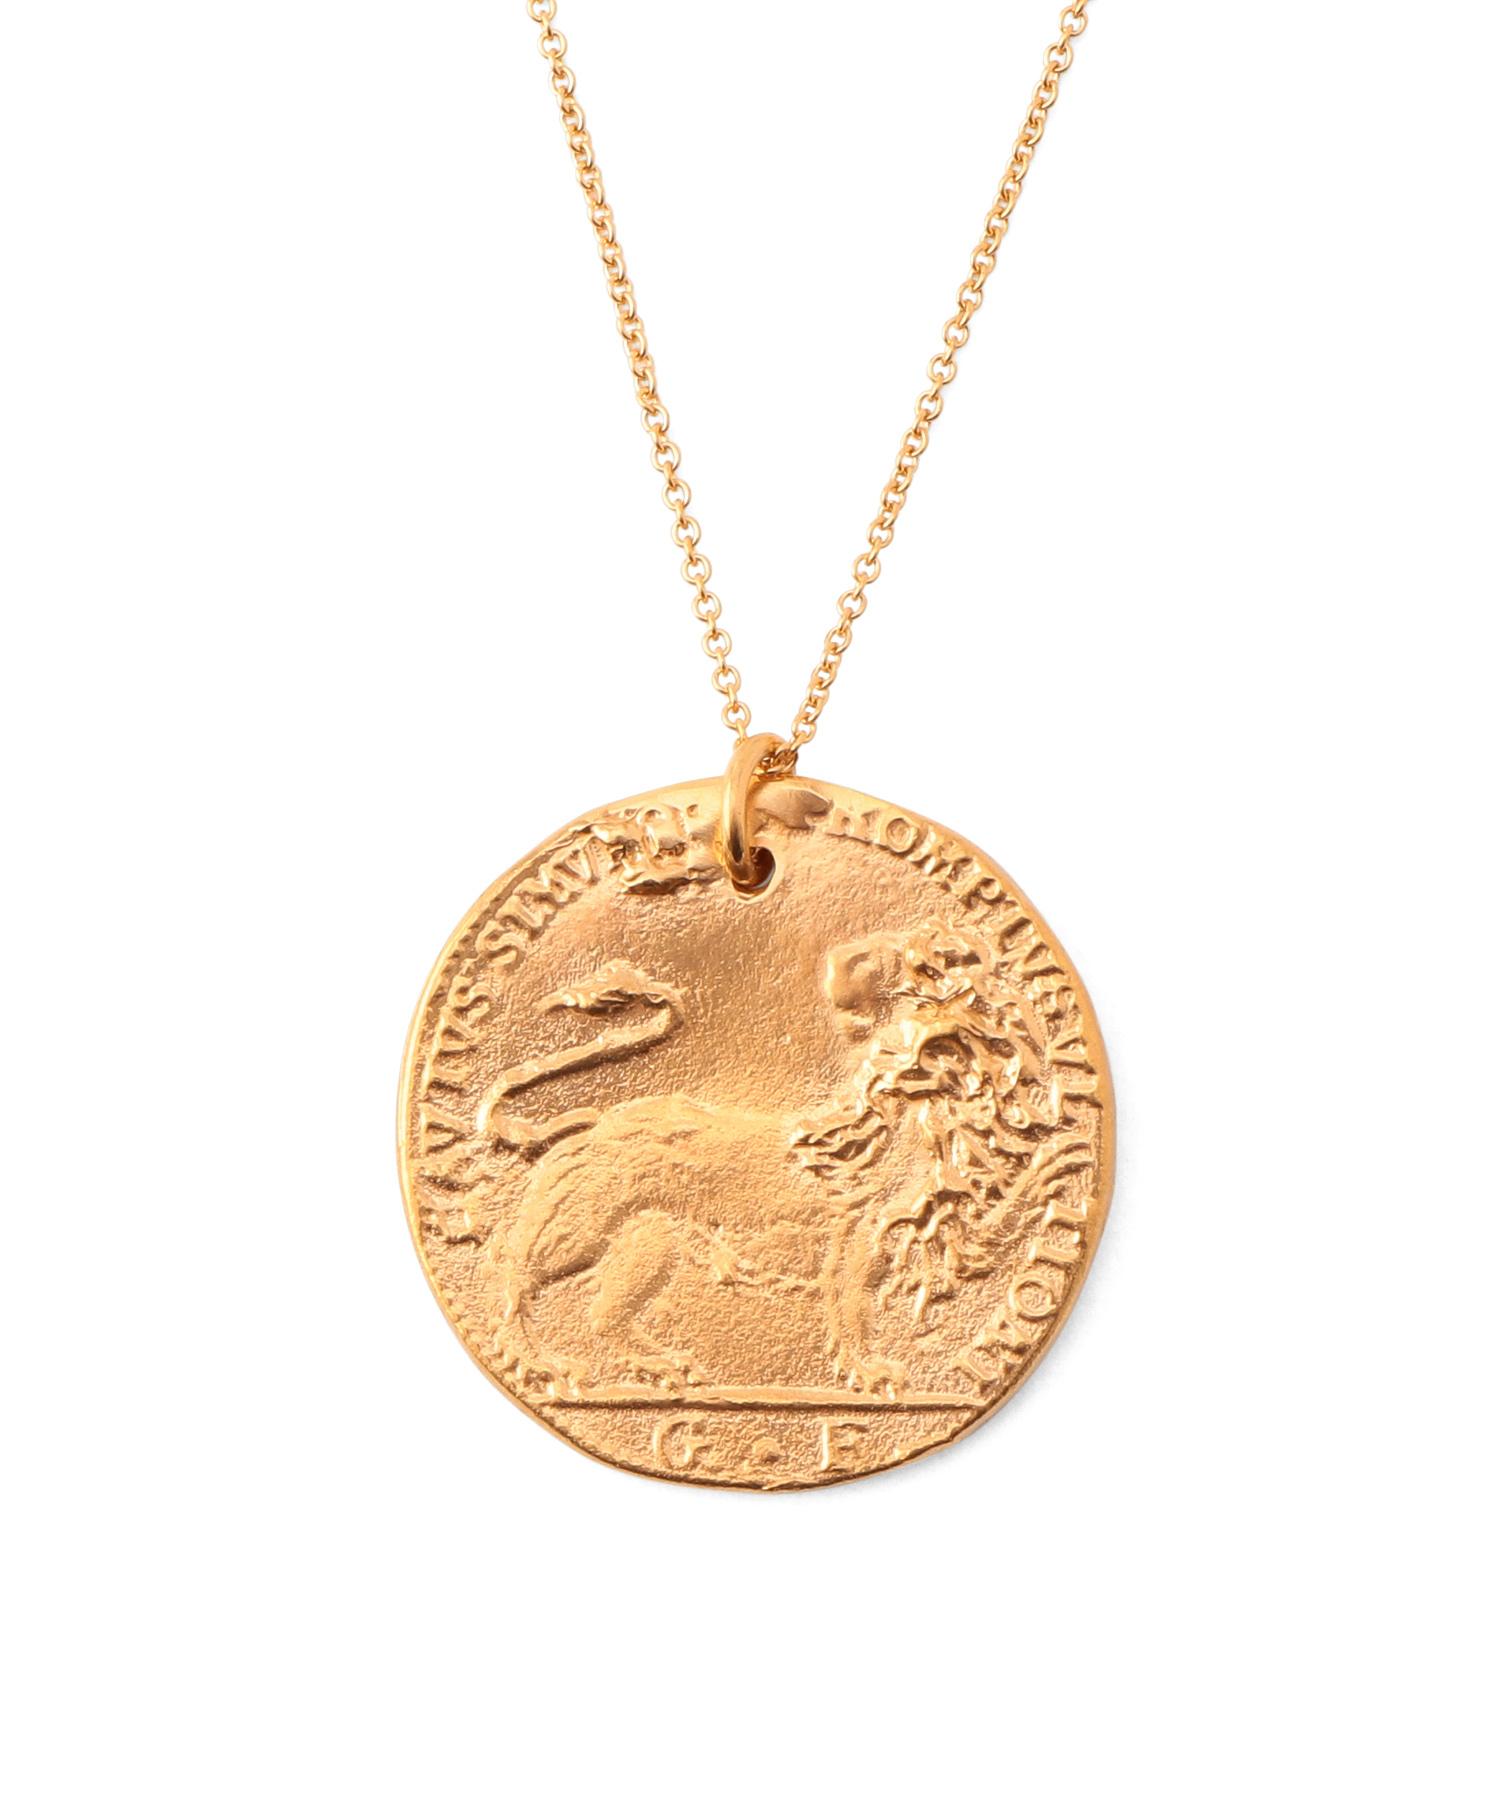 "【VERY 11月号掲載商品】alighieri ""Il Leone"" Coin Pendant"